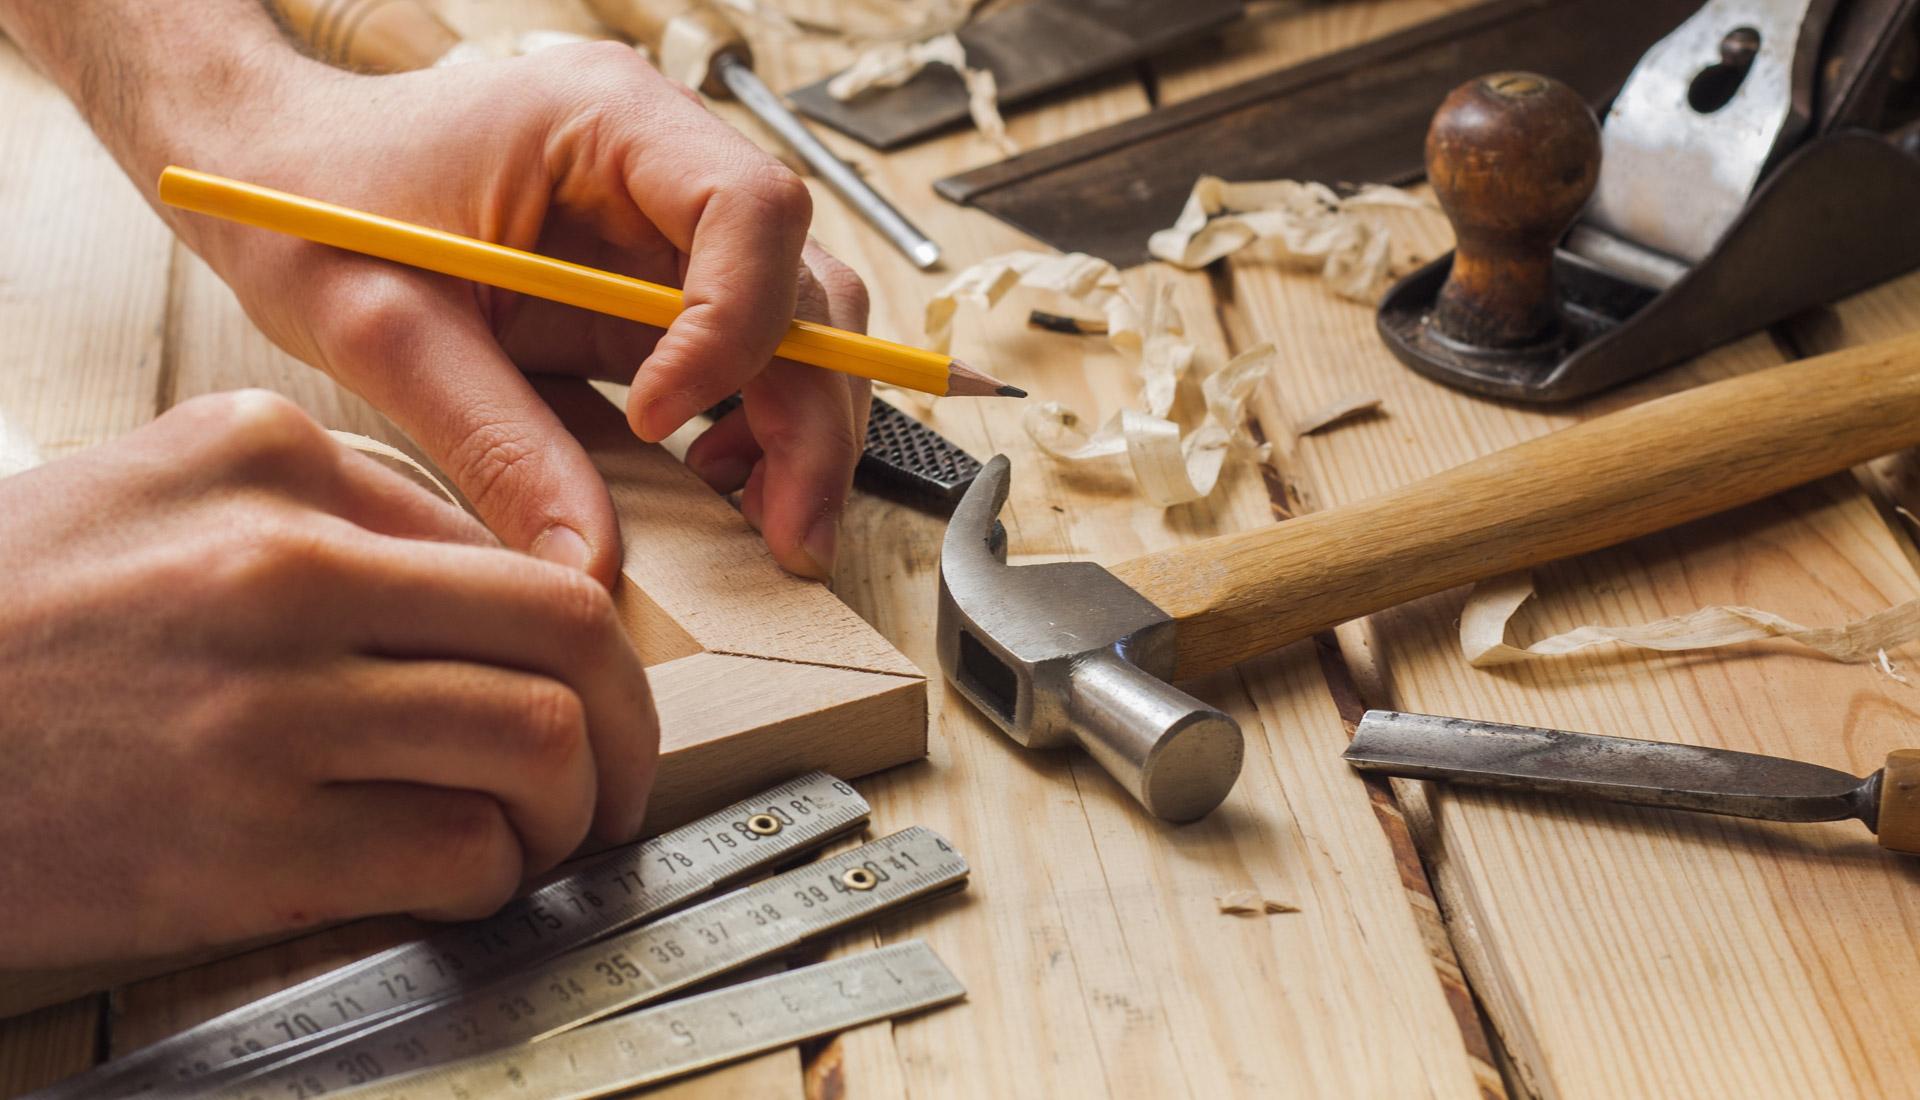 Carpenter Near Me Costs & Services - Checklist & Free Quotes